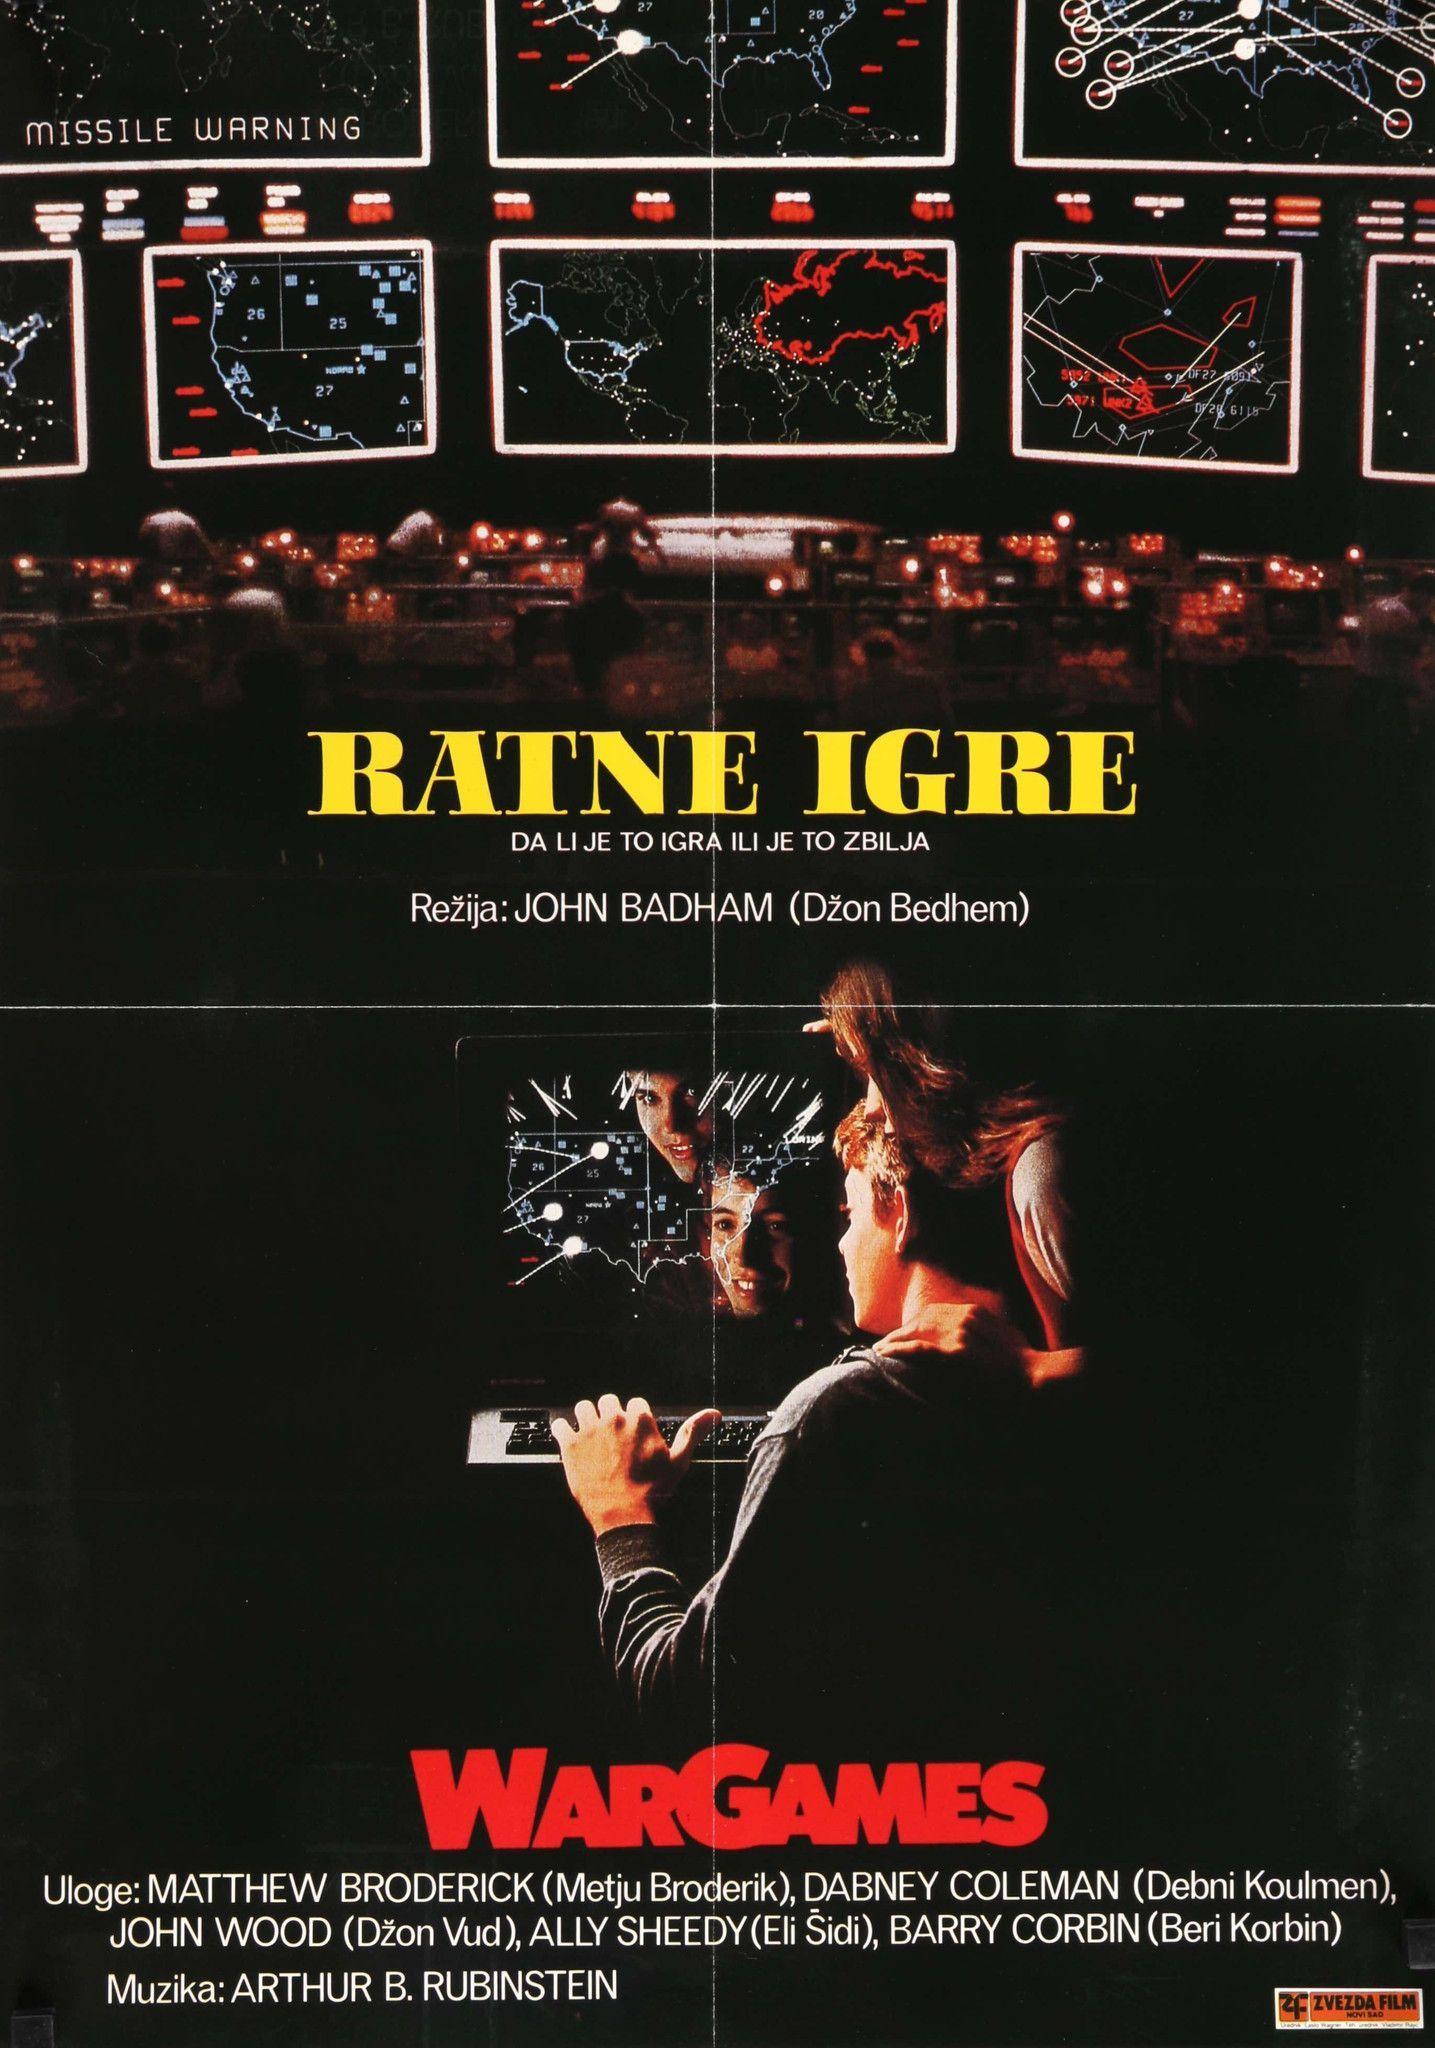 MESRINE FILM 1983 TÉLÉCHARGER